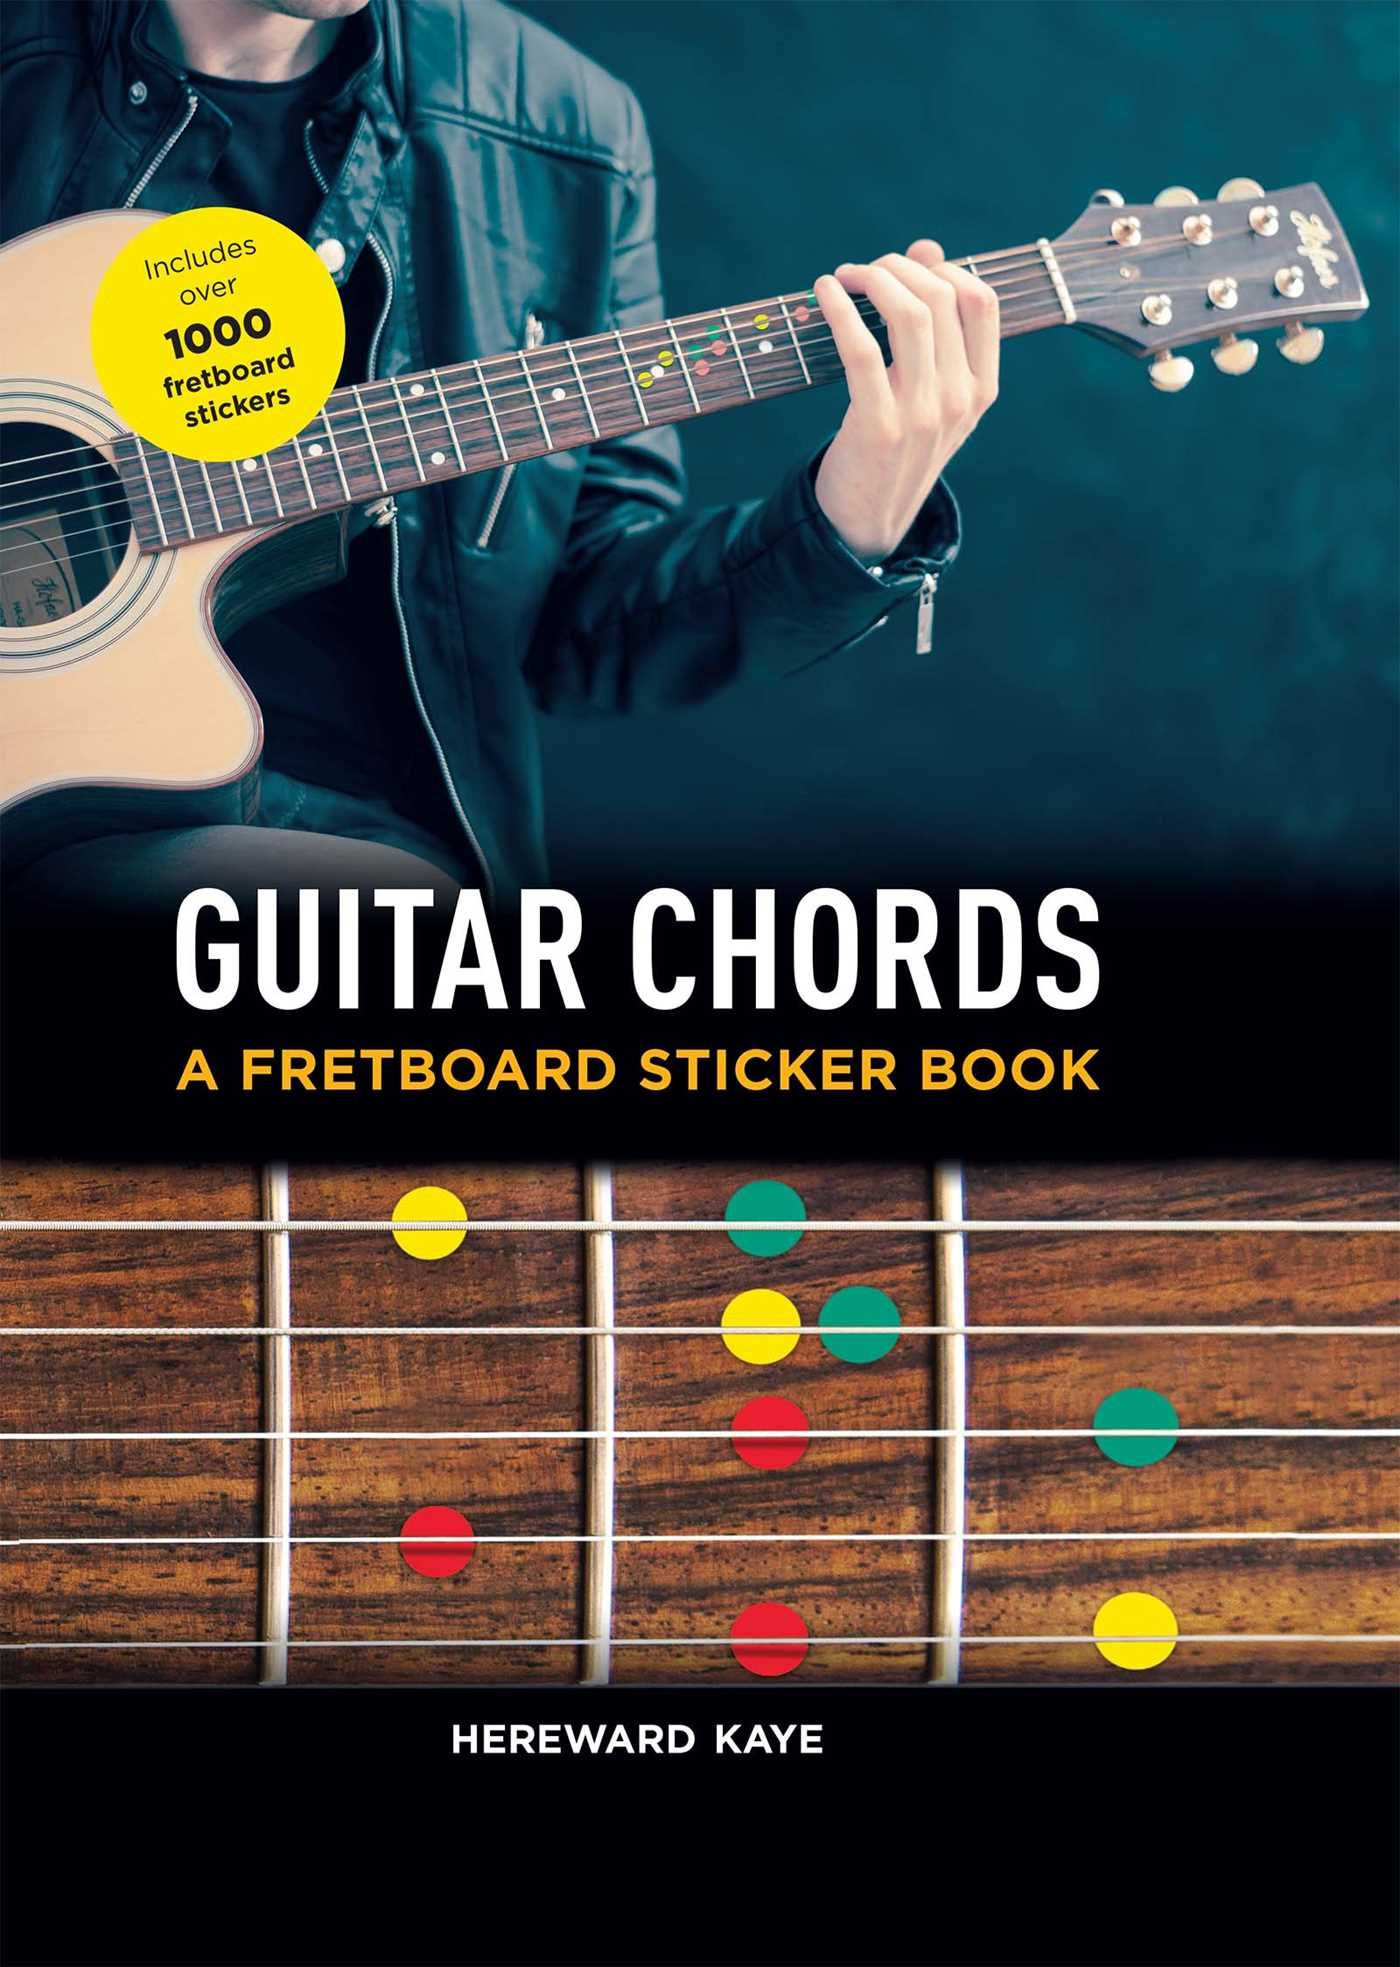 Guitar Chords A Fretboard Sticker Book Hereward Kaye